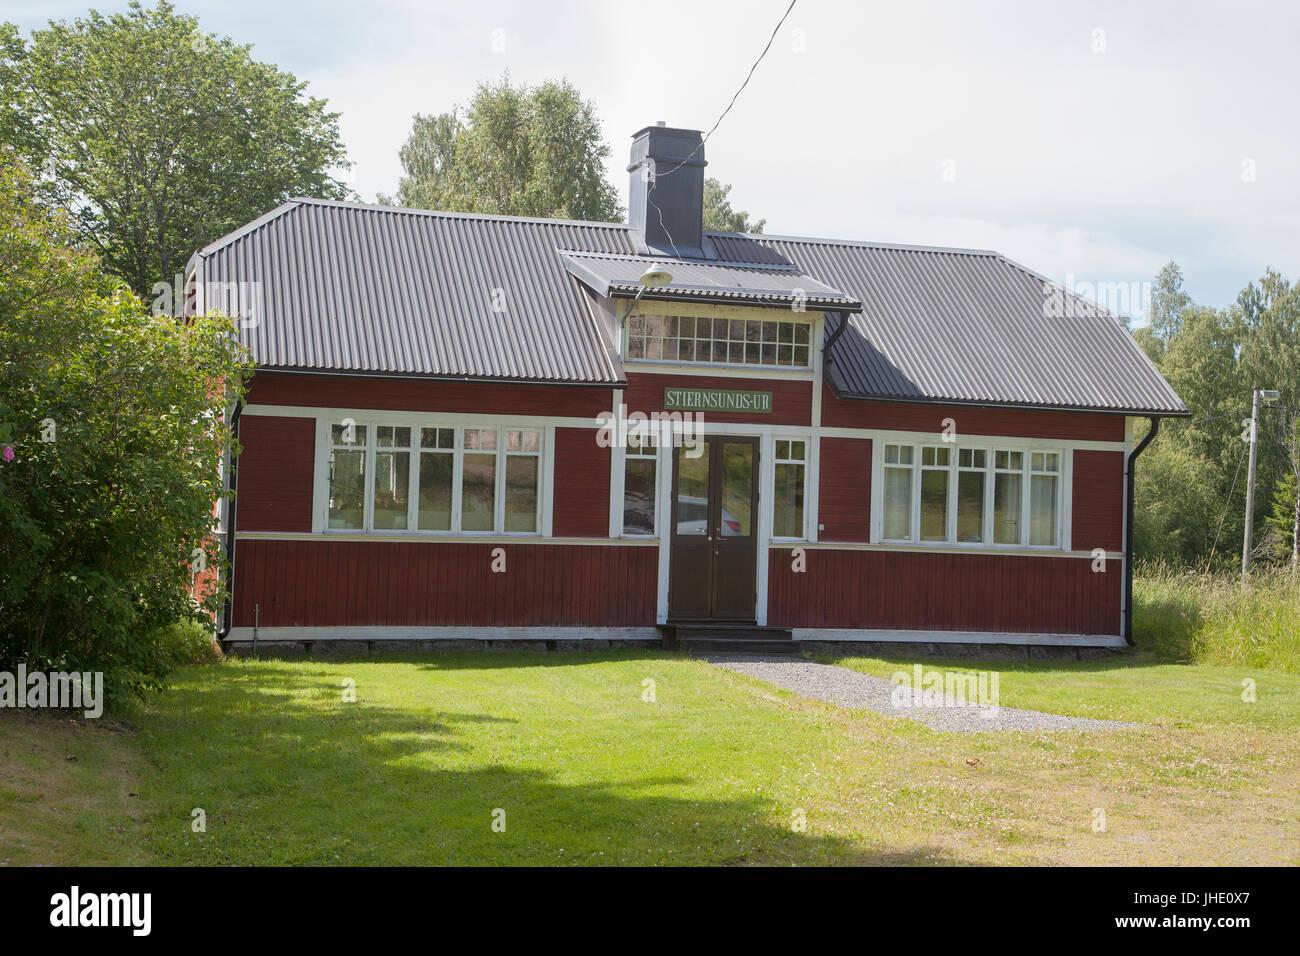 STJÄRNSUND bruk in Dalarna 2017 workshop building where the Stjärnsunds clocks has been produced since - Stock Image